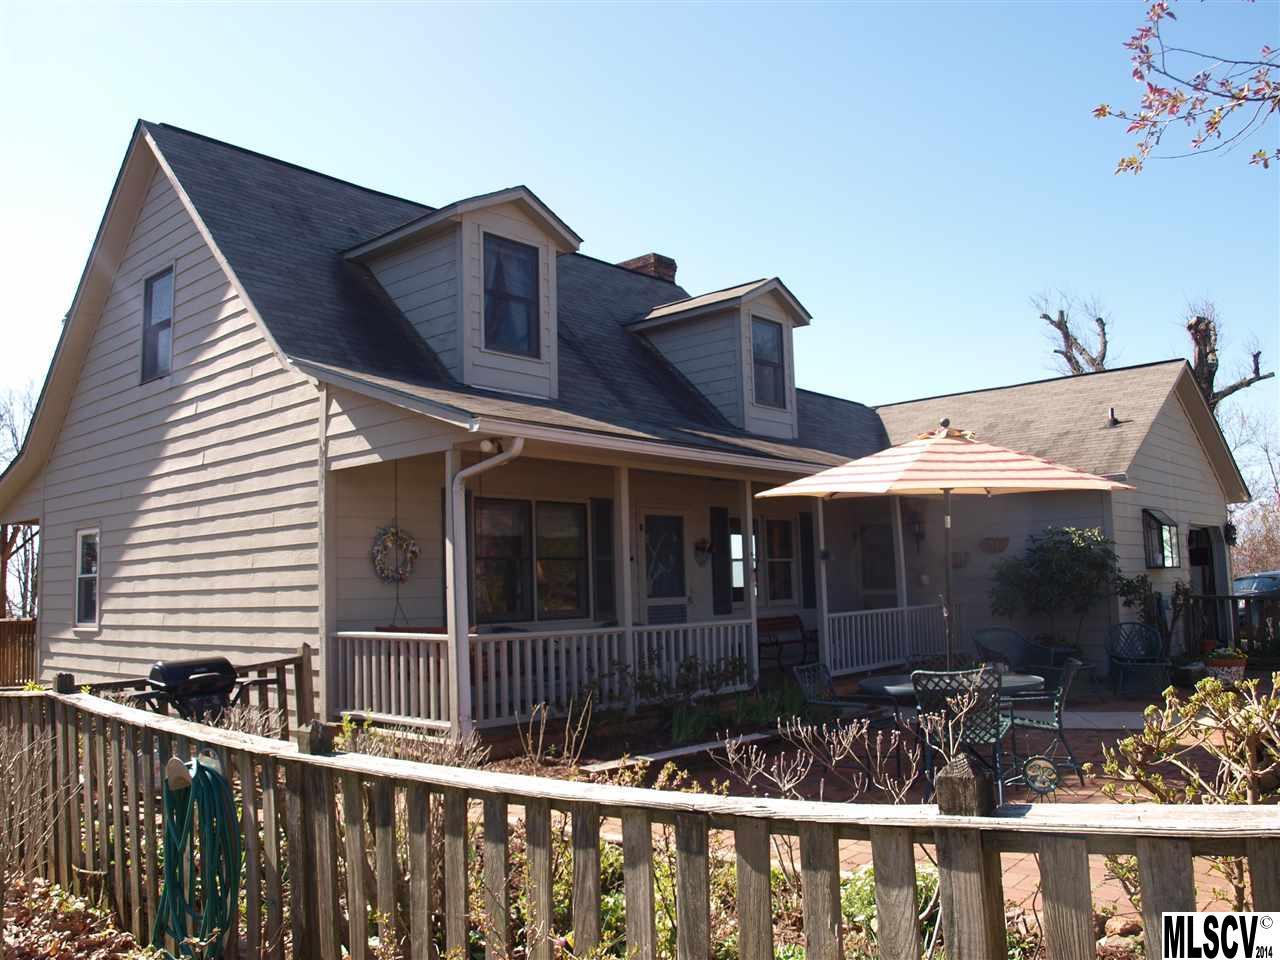 Real Estate for Sale, ListingId:32597556, location: 3413 MOUNTAIN RIDGE CIR Valdese 28690